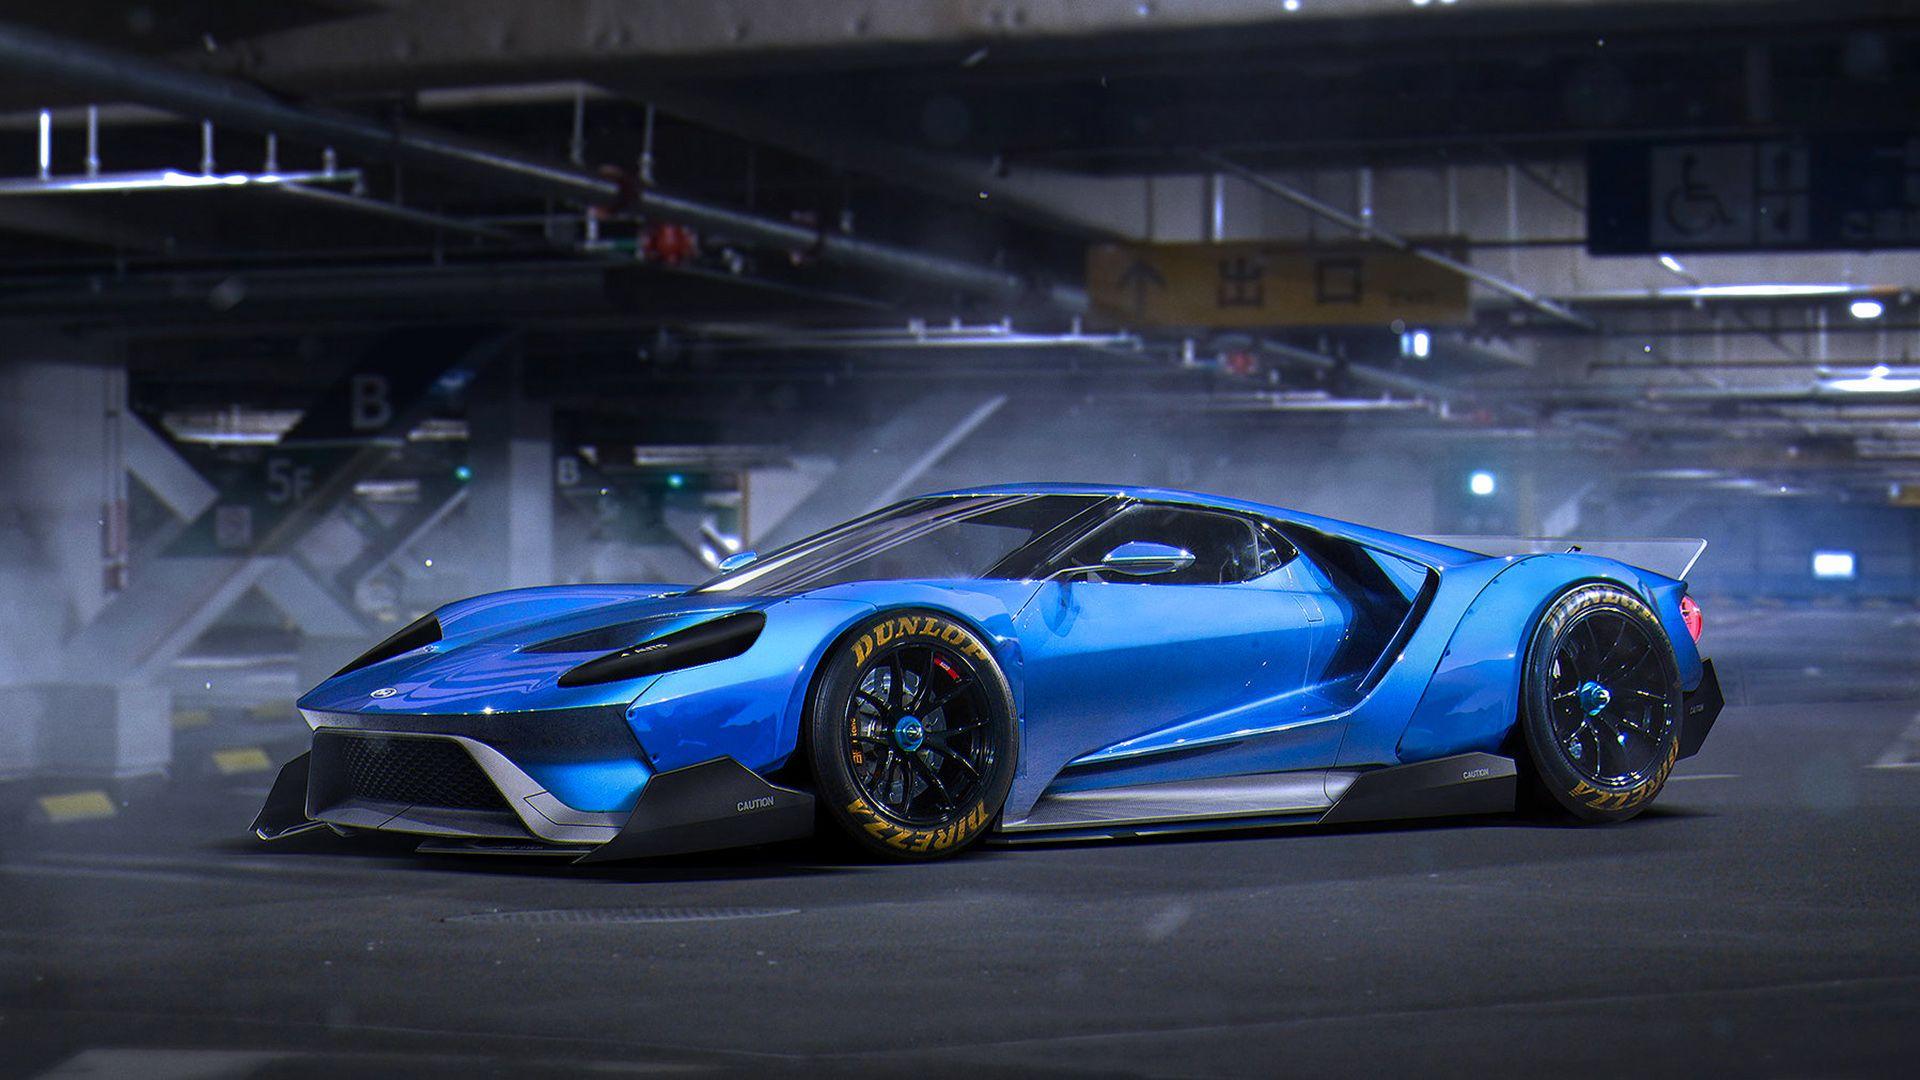 Ford Gt Concept Cars Futuristic Cars